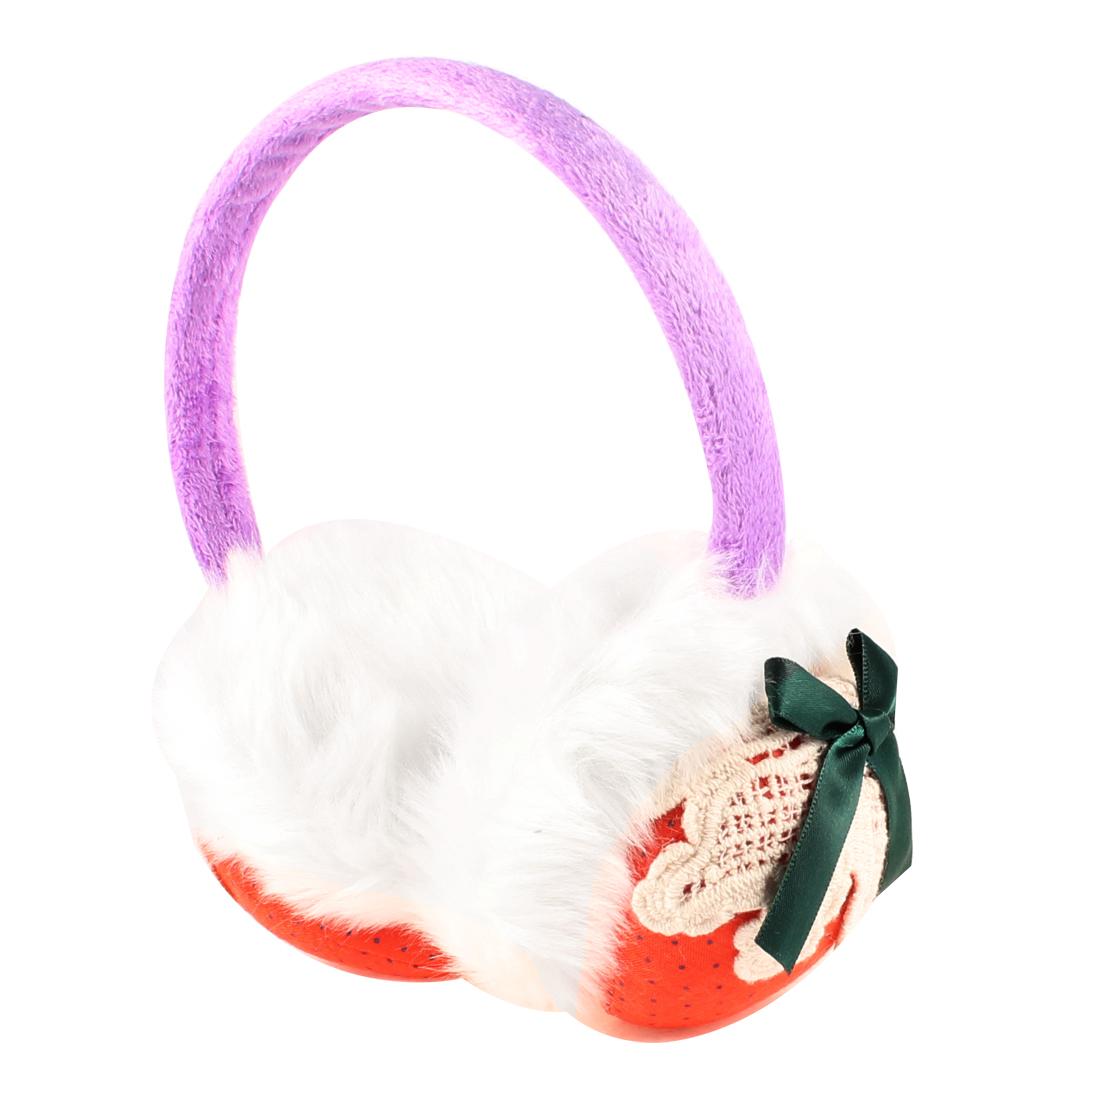 Plush Strawberry Print Teal Blue Bowtie Round Back Earmuff for Women Purple